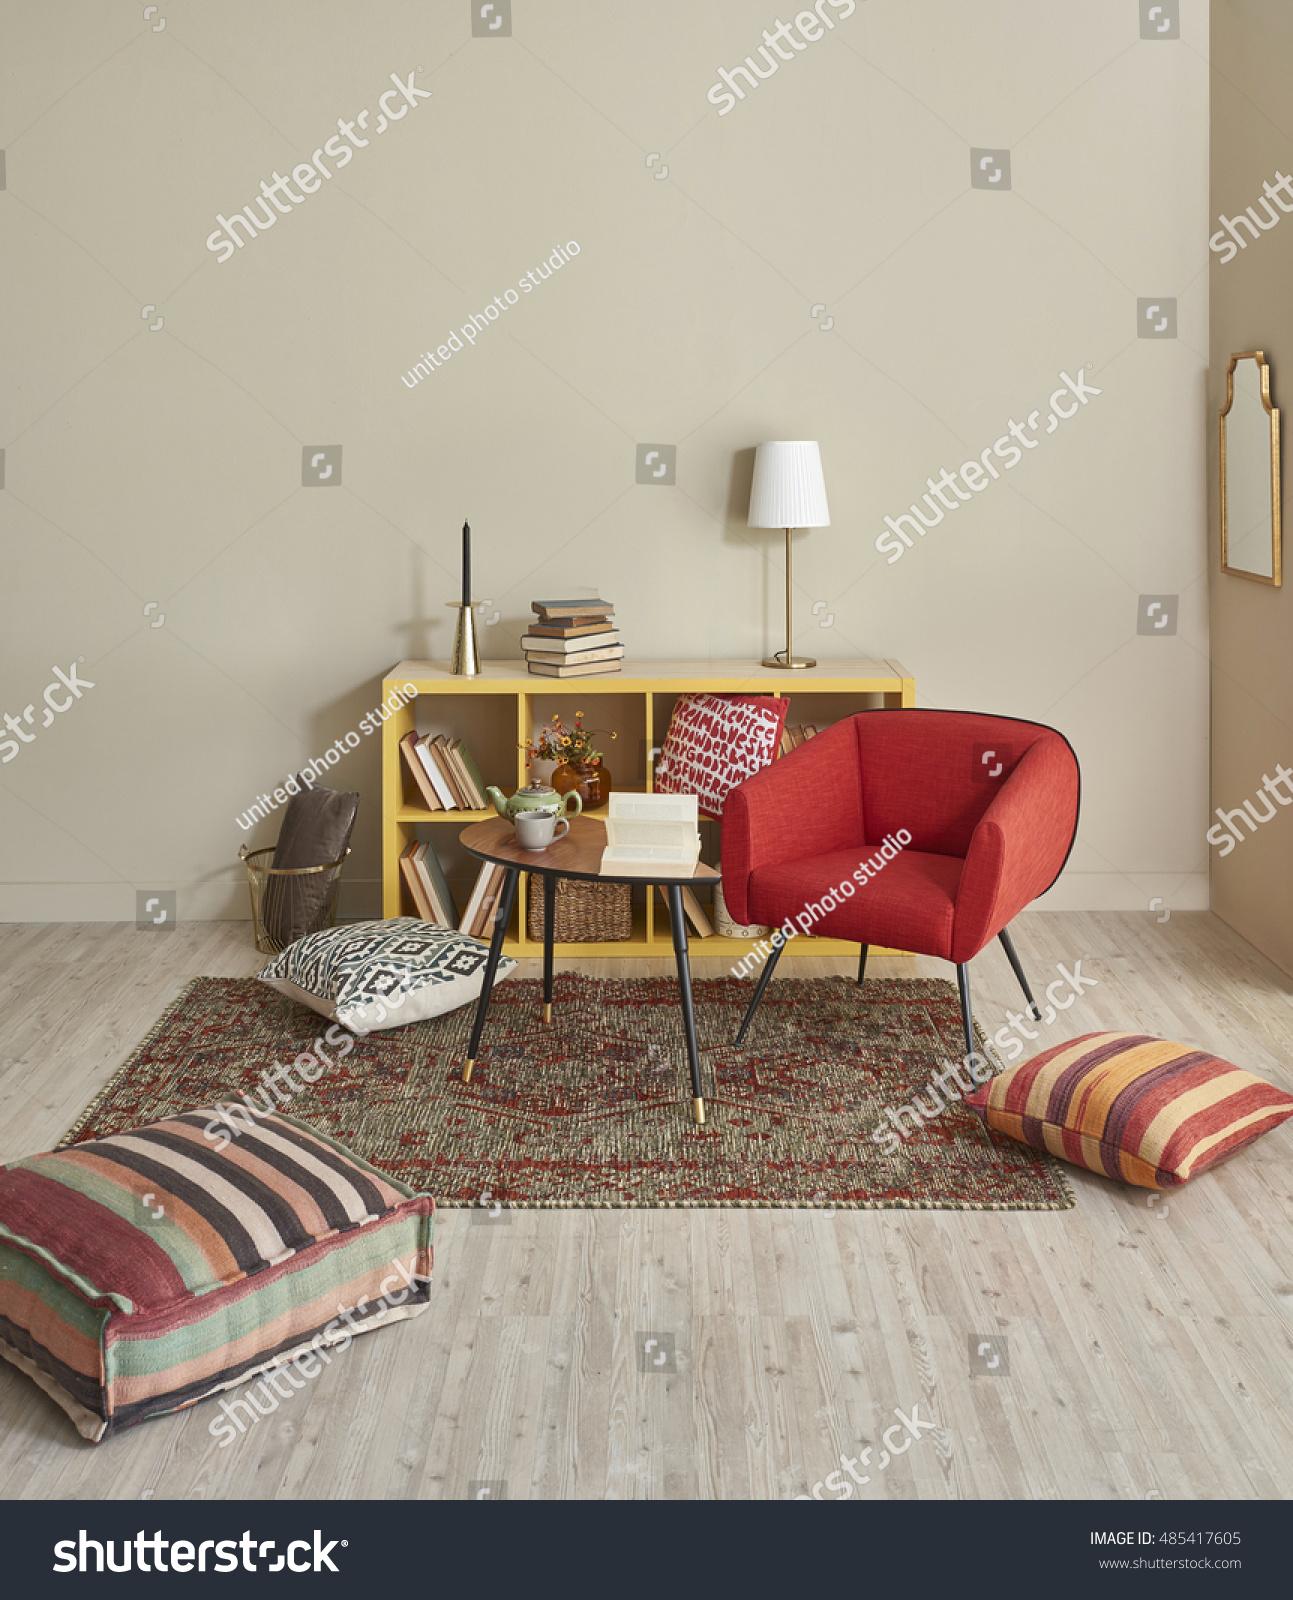 Modern interior room nice furniture inside stock photo for Nice furniture